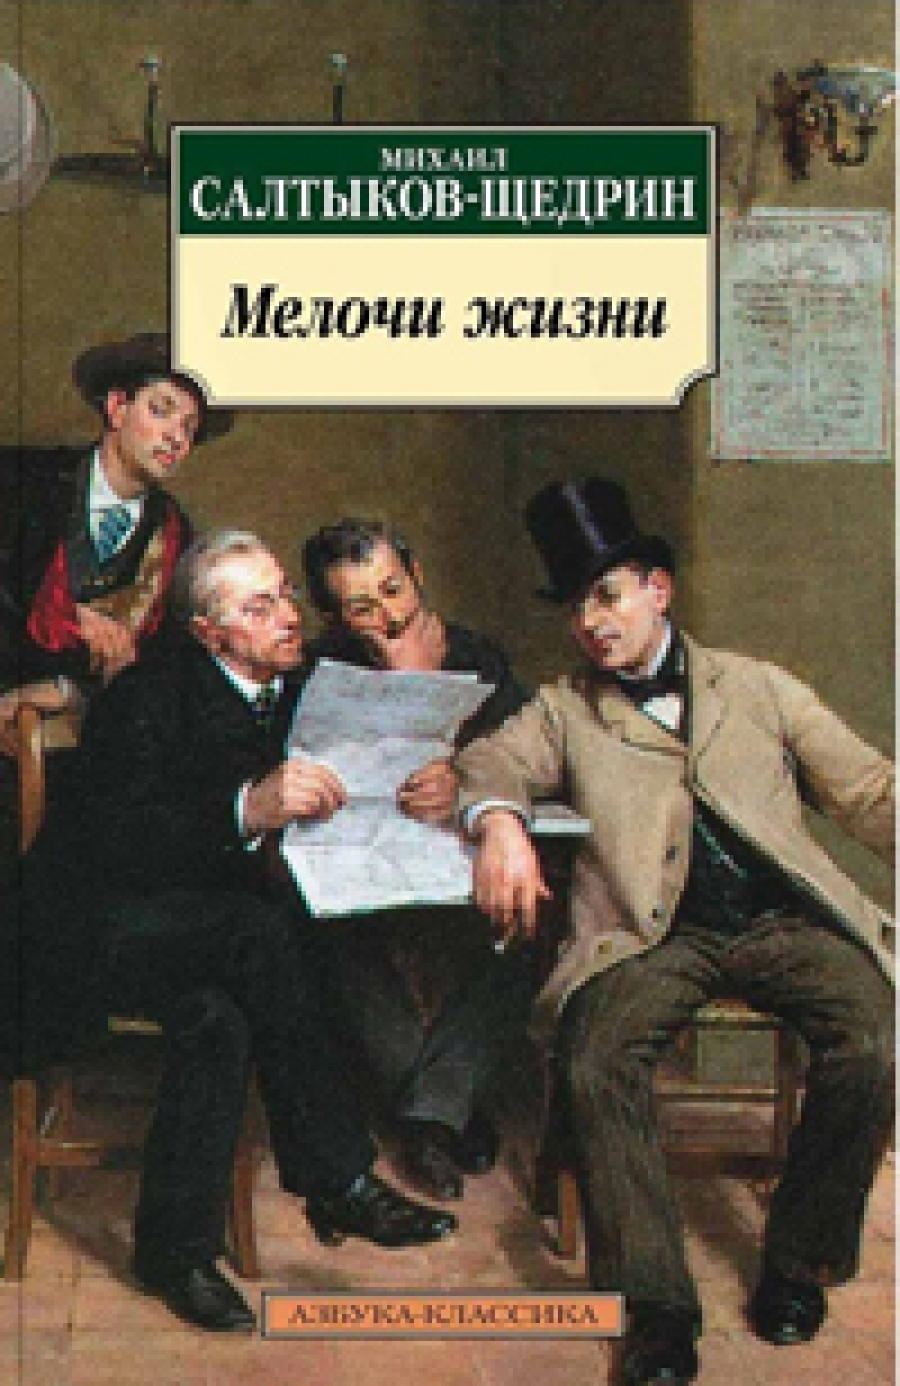 Михаил САЛТЫКОВ-ЩЕДРИН. Мелочи жизни (12+)